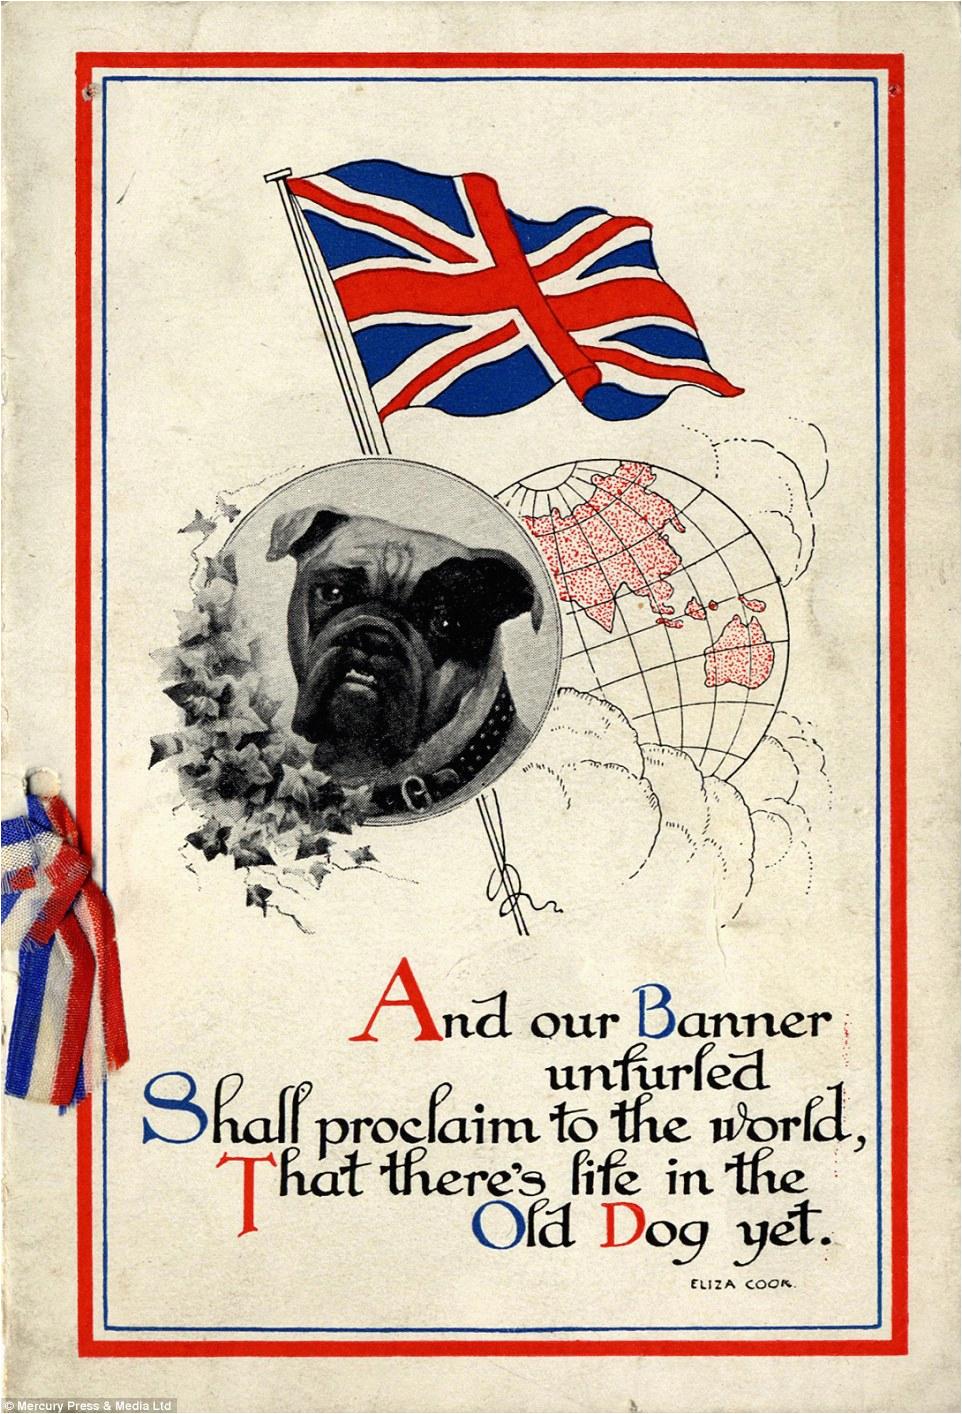 historic greetings cards glimpse humour stiff upper lip attitude life wwi line